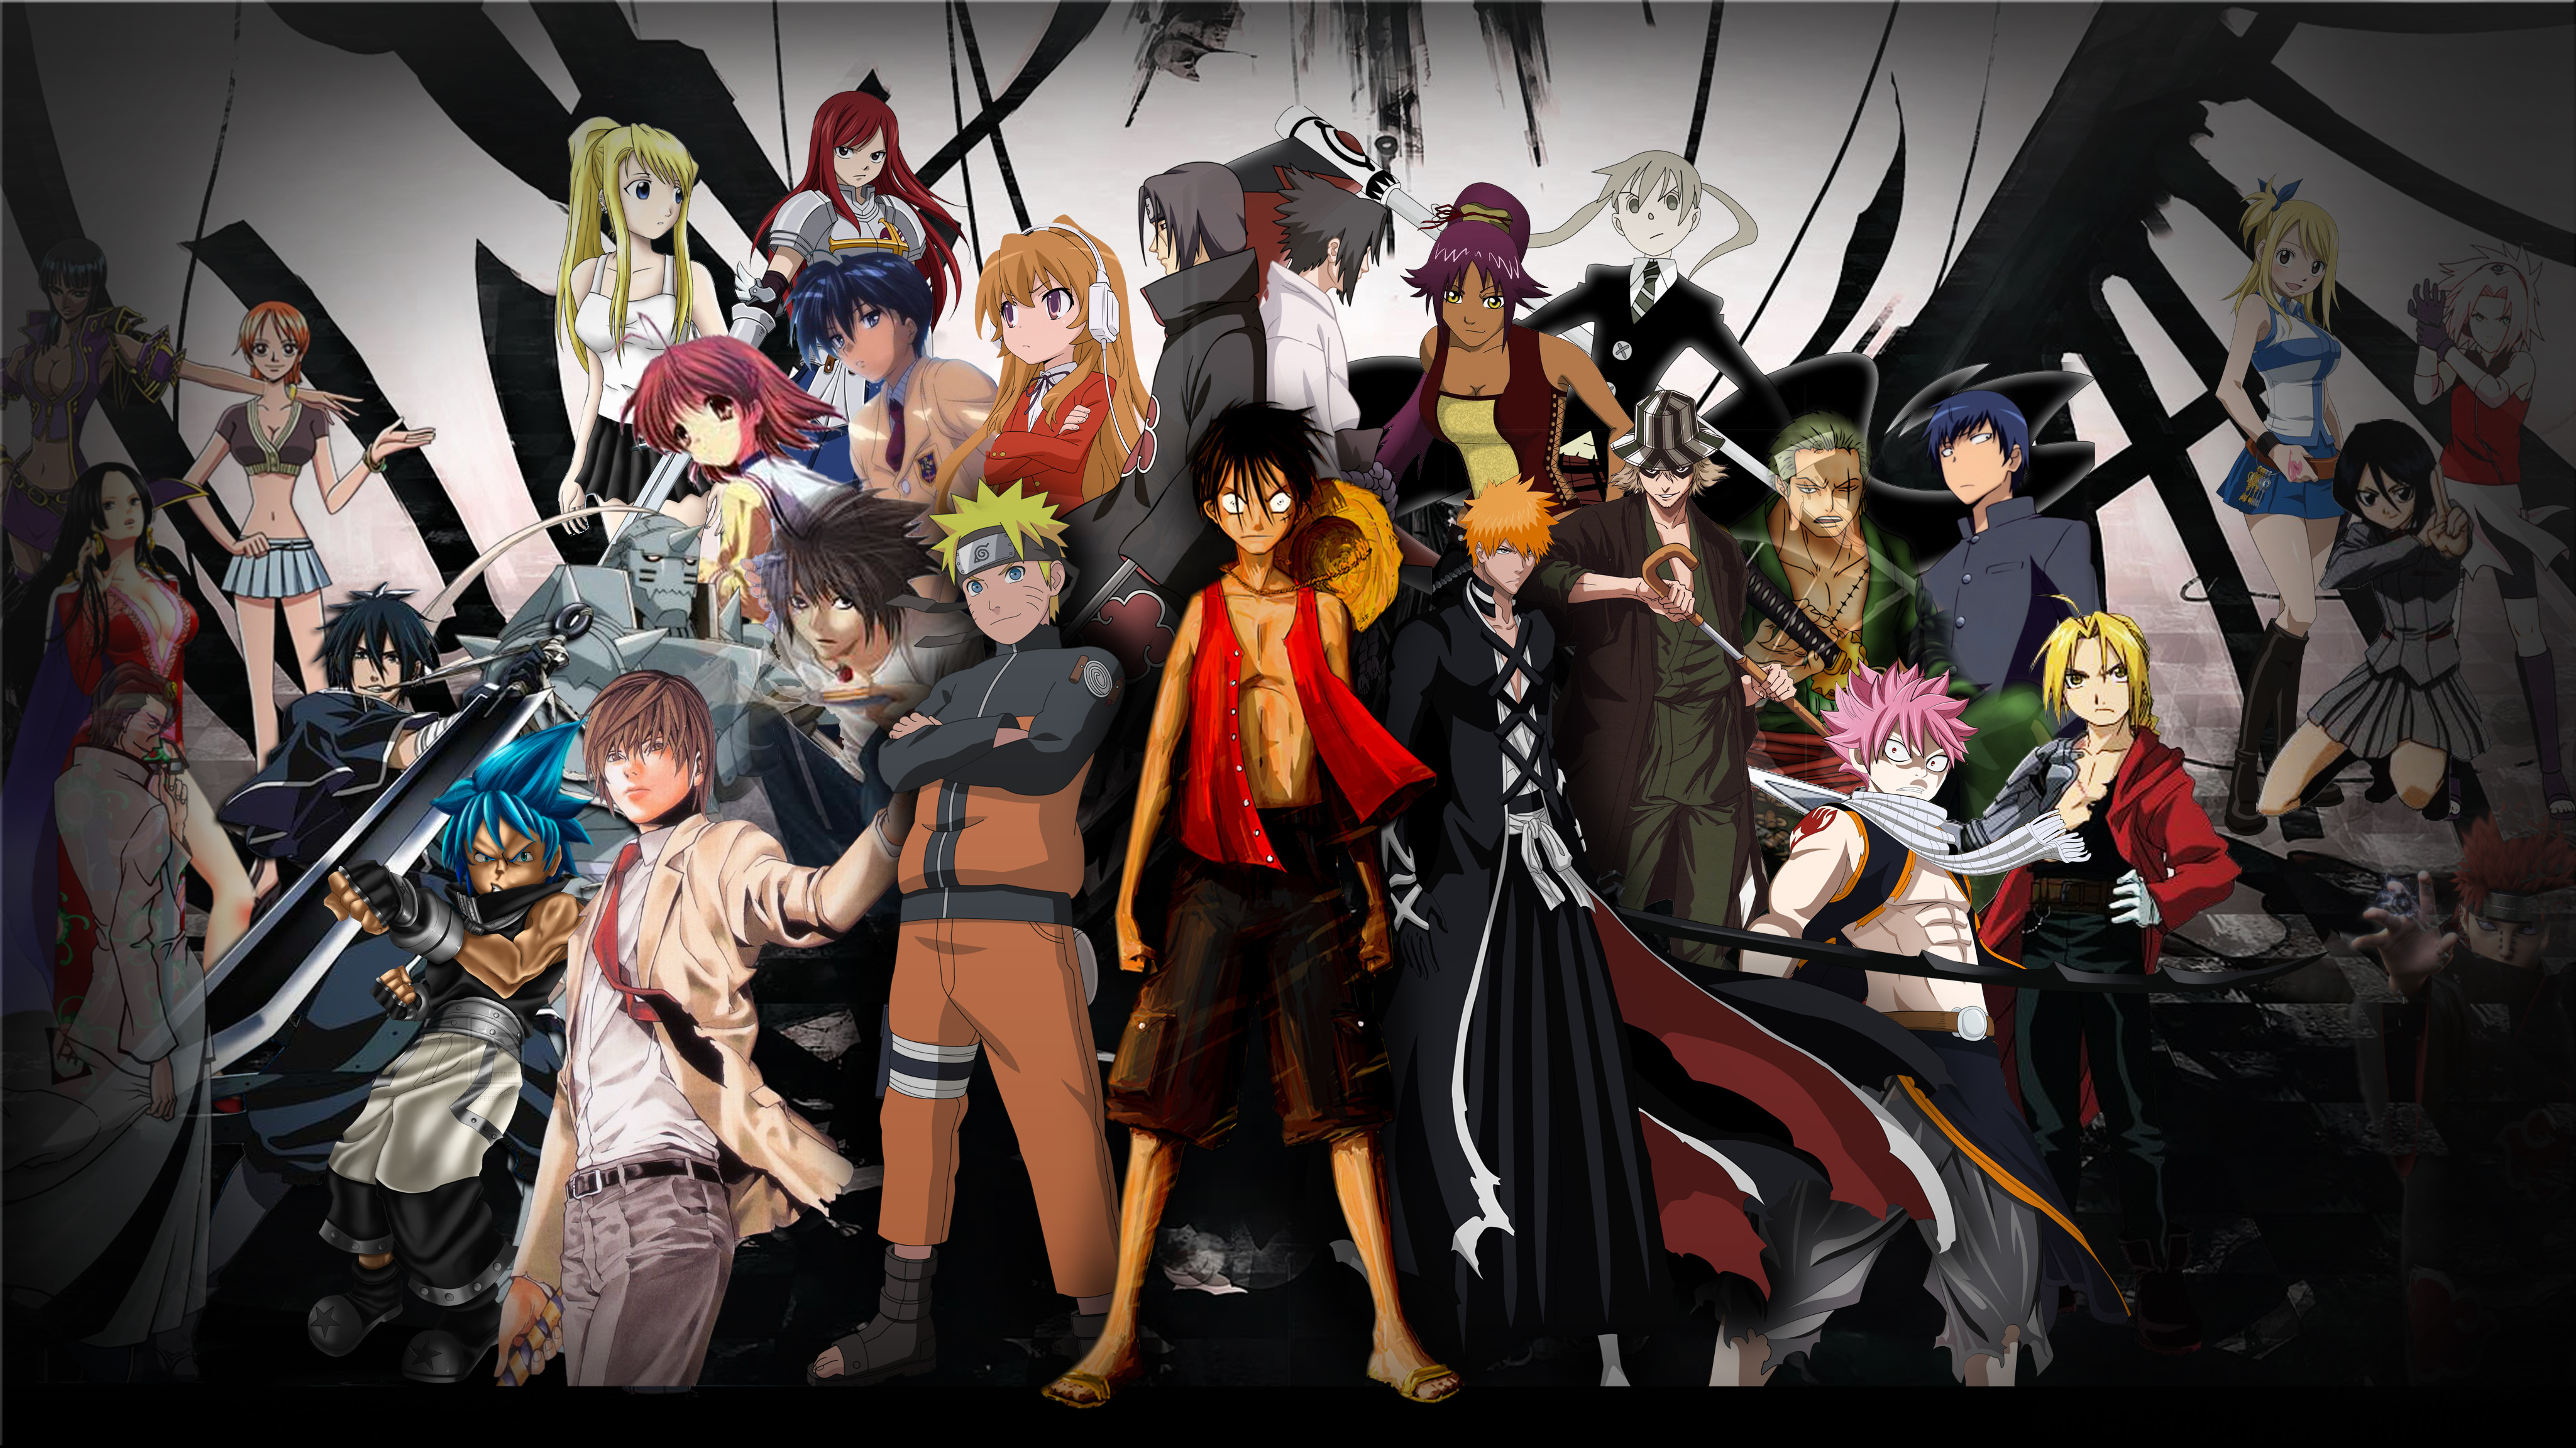 4500 Gambar Anime Hd Untuk Laptop HD Terbaik